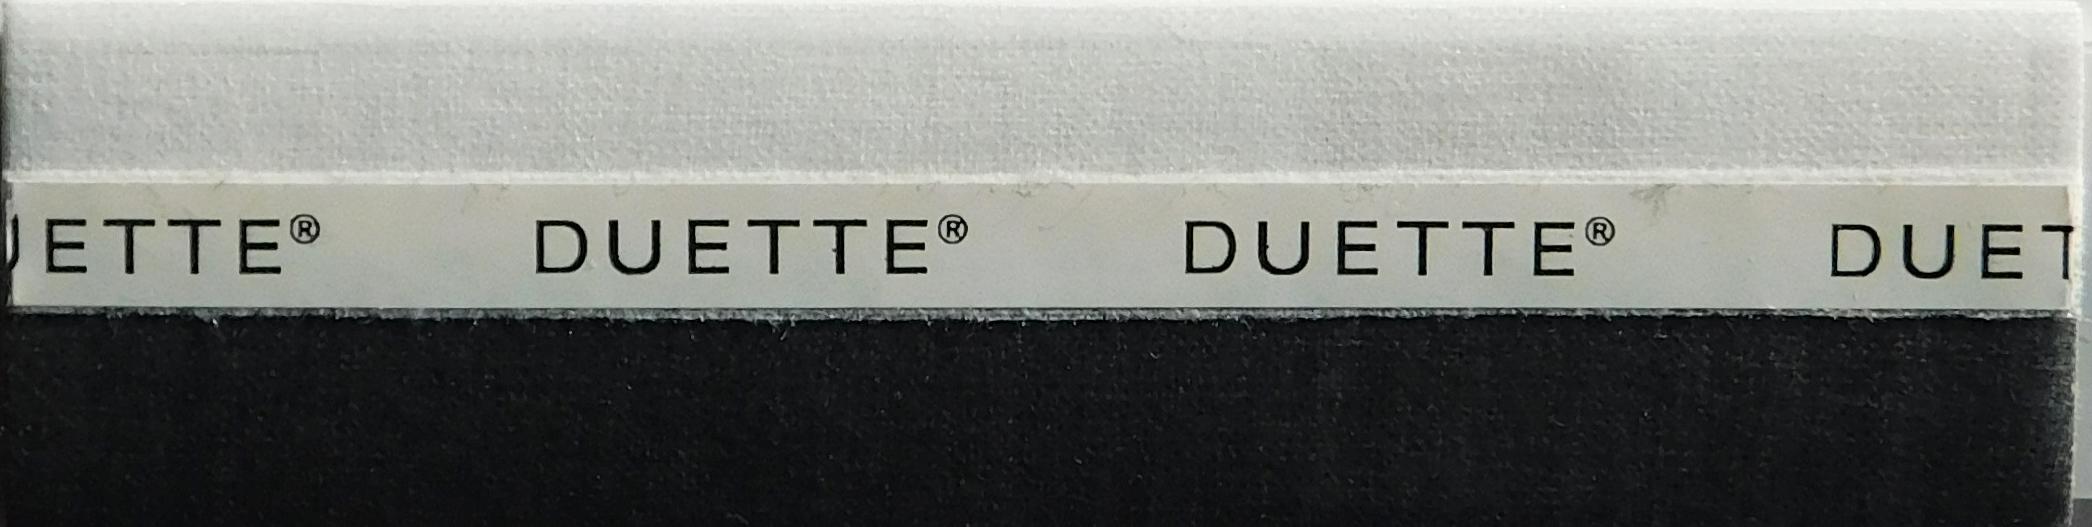 Elan Rook Duette Blind Fabric